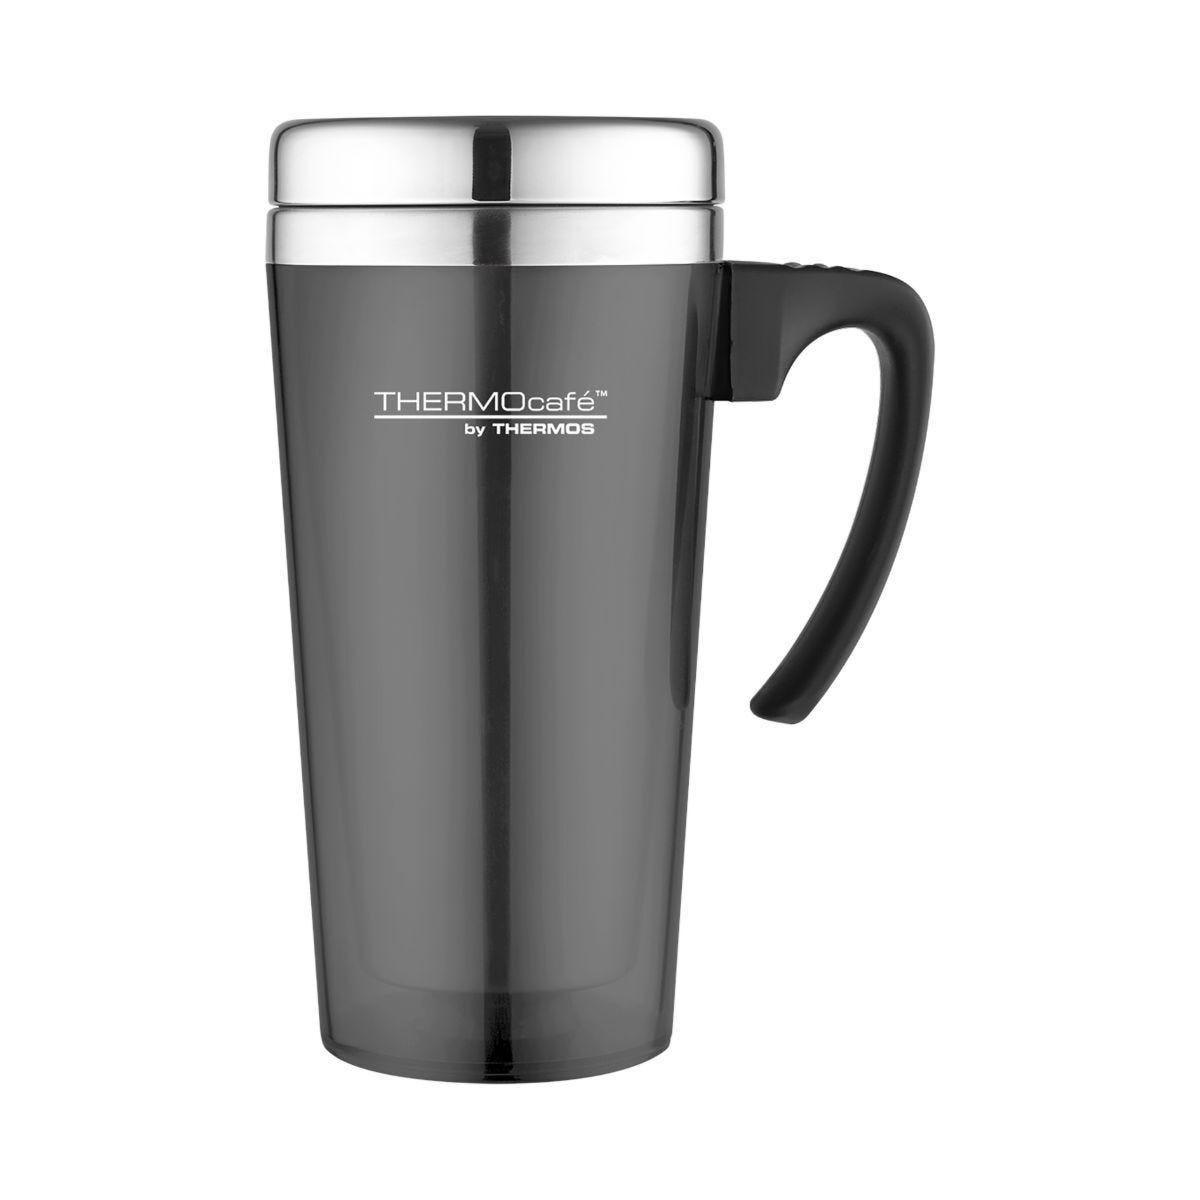 ThermoCafe Thermos Translucent Travel Mug 420ml Grey